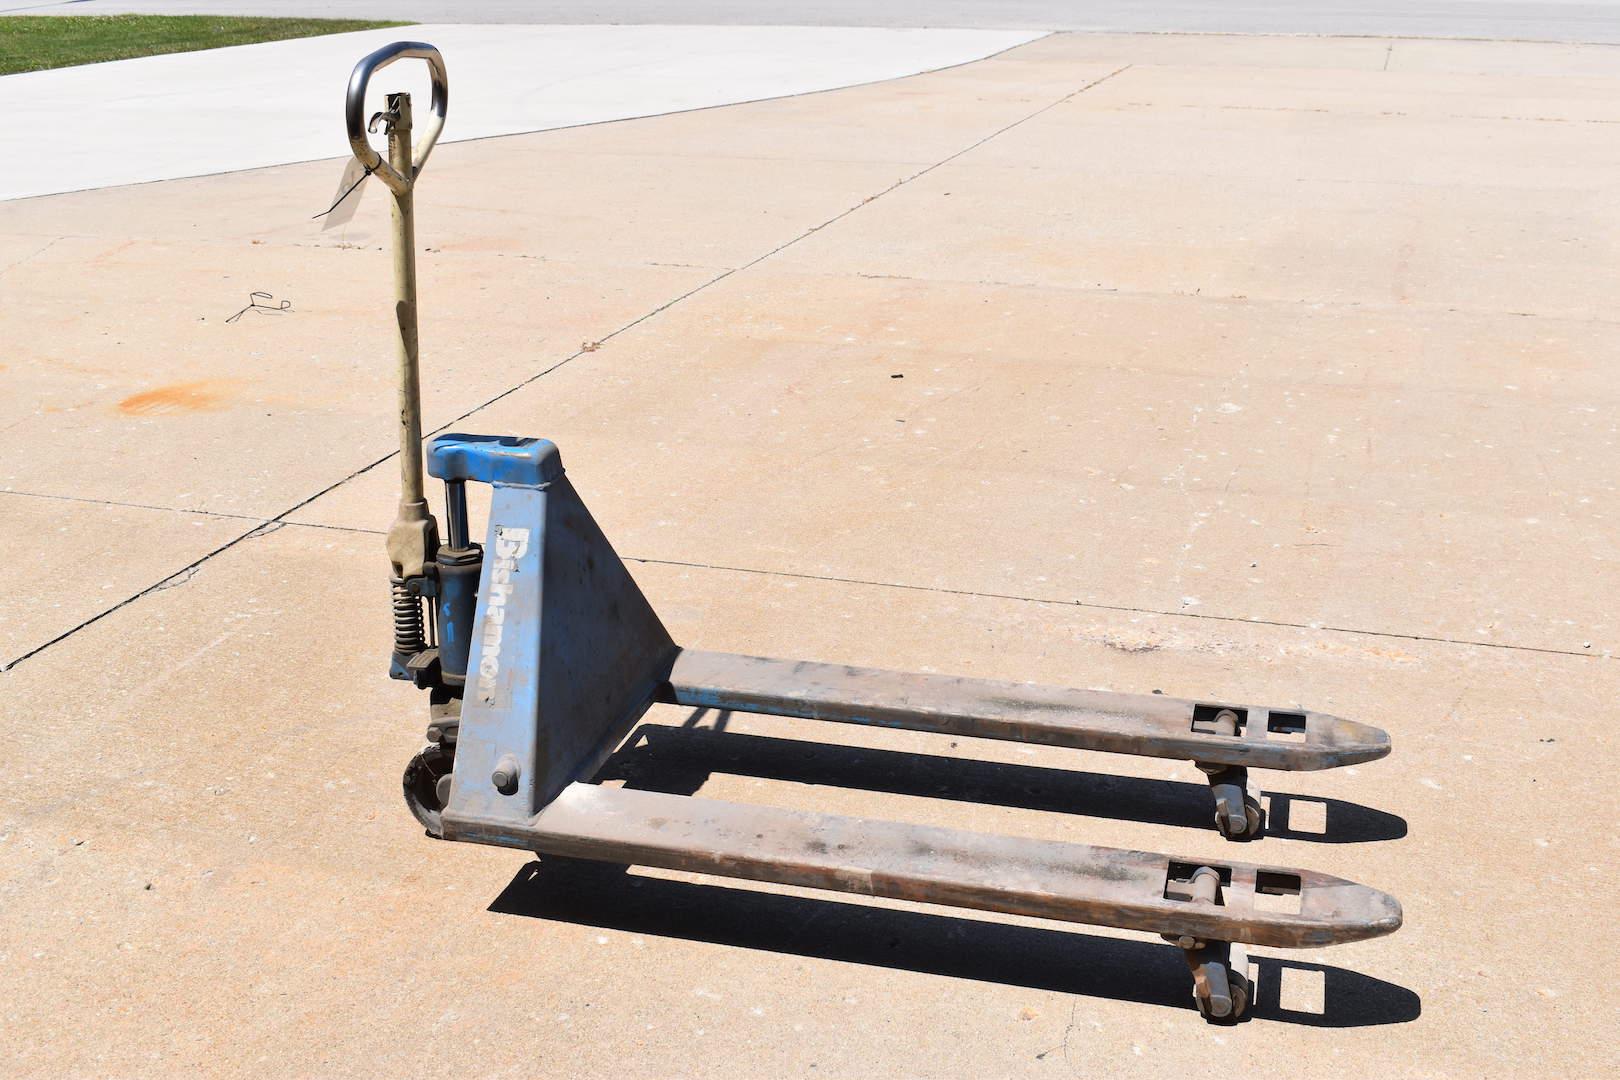 Lot 56 - Bishamon 5500 lb. Hydraulic Pallet Jack